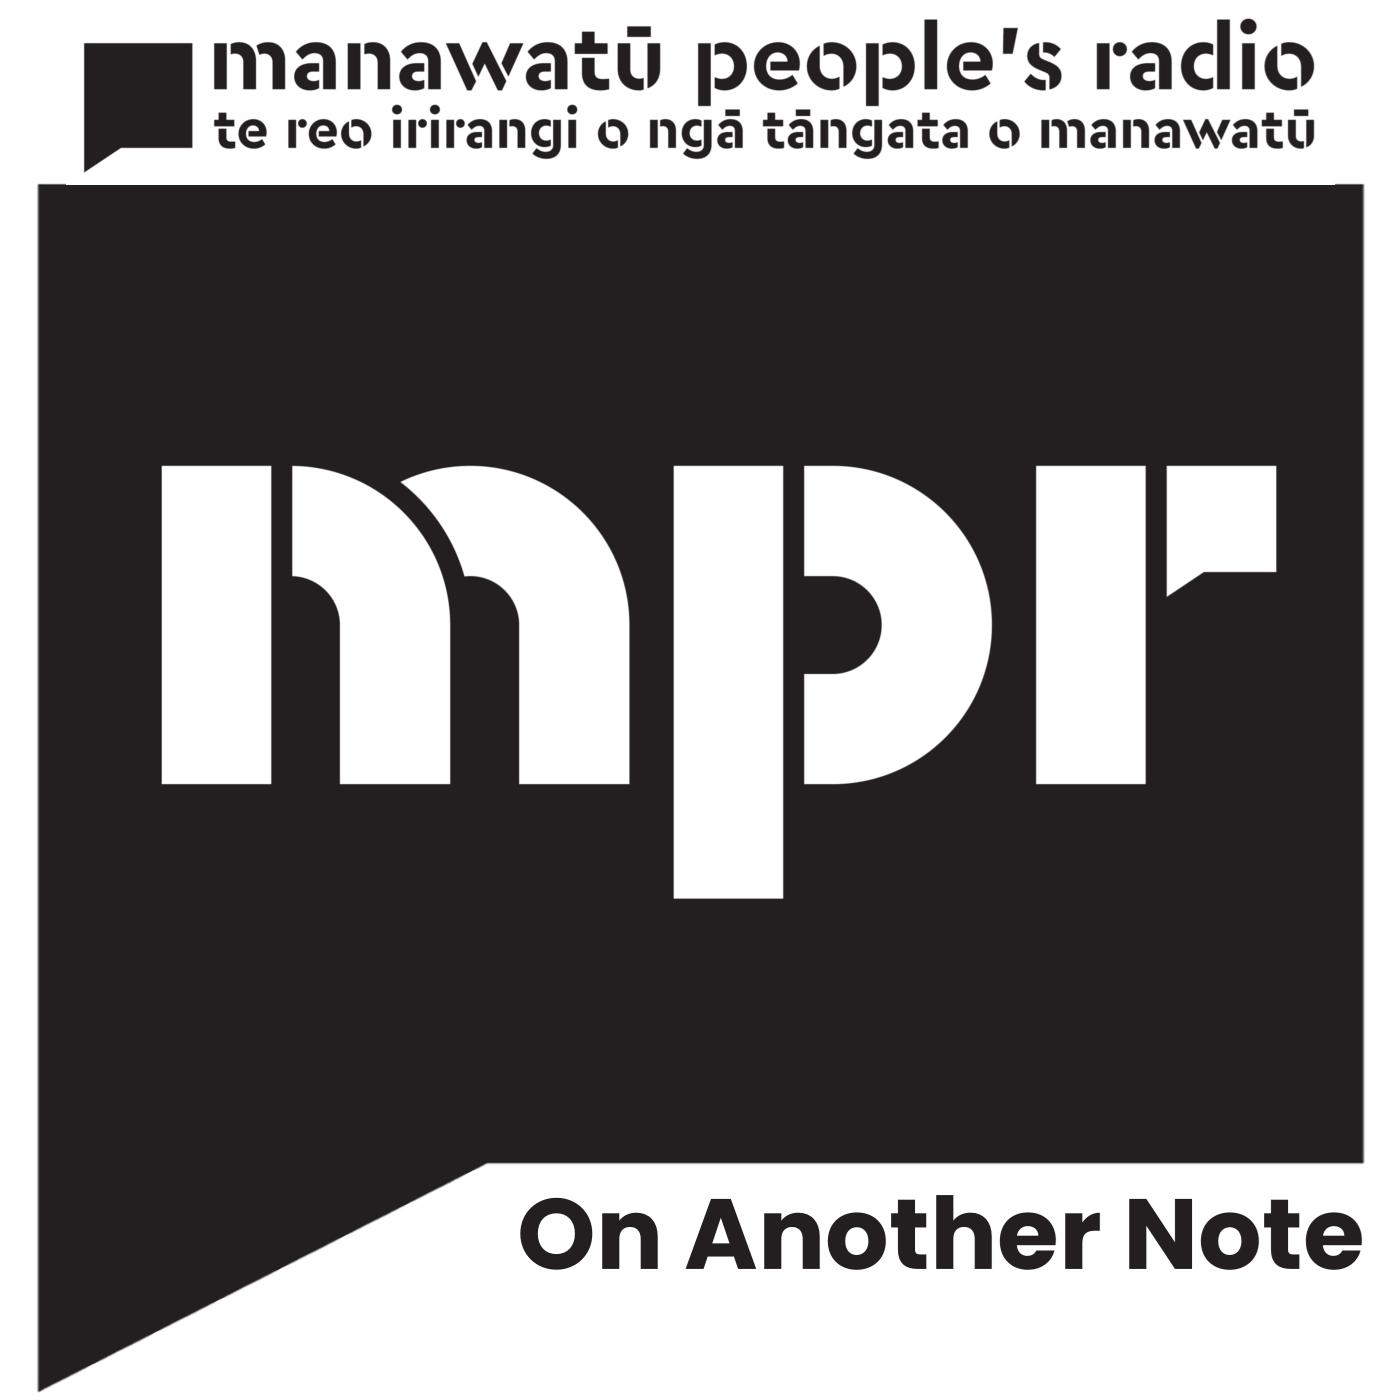 https://cdn.accessradio.org/StationFolder/manawatu/Images/MPROnAnotherNote.png